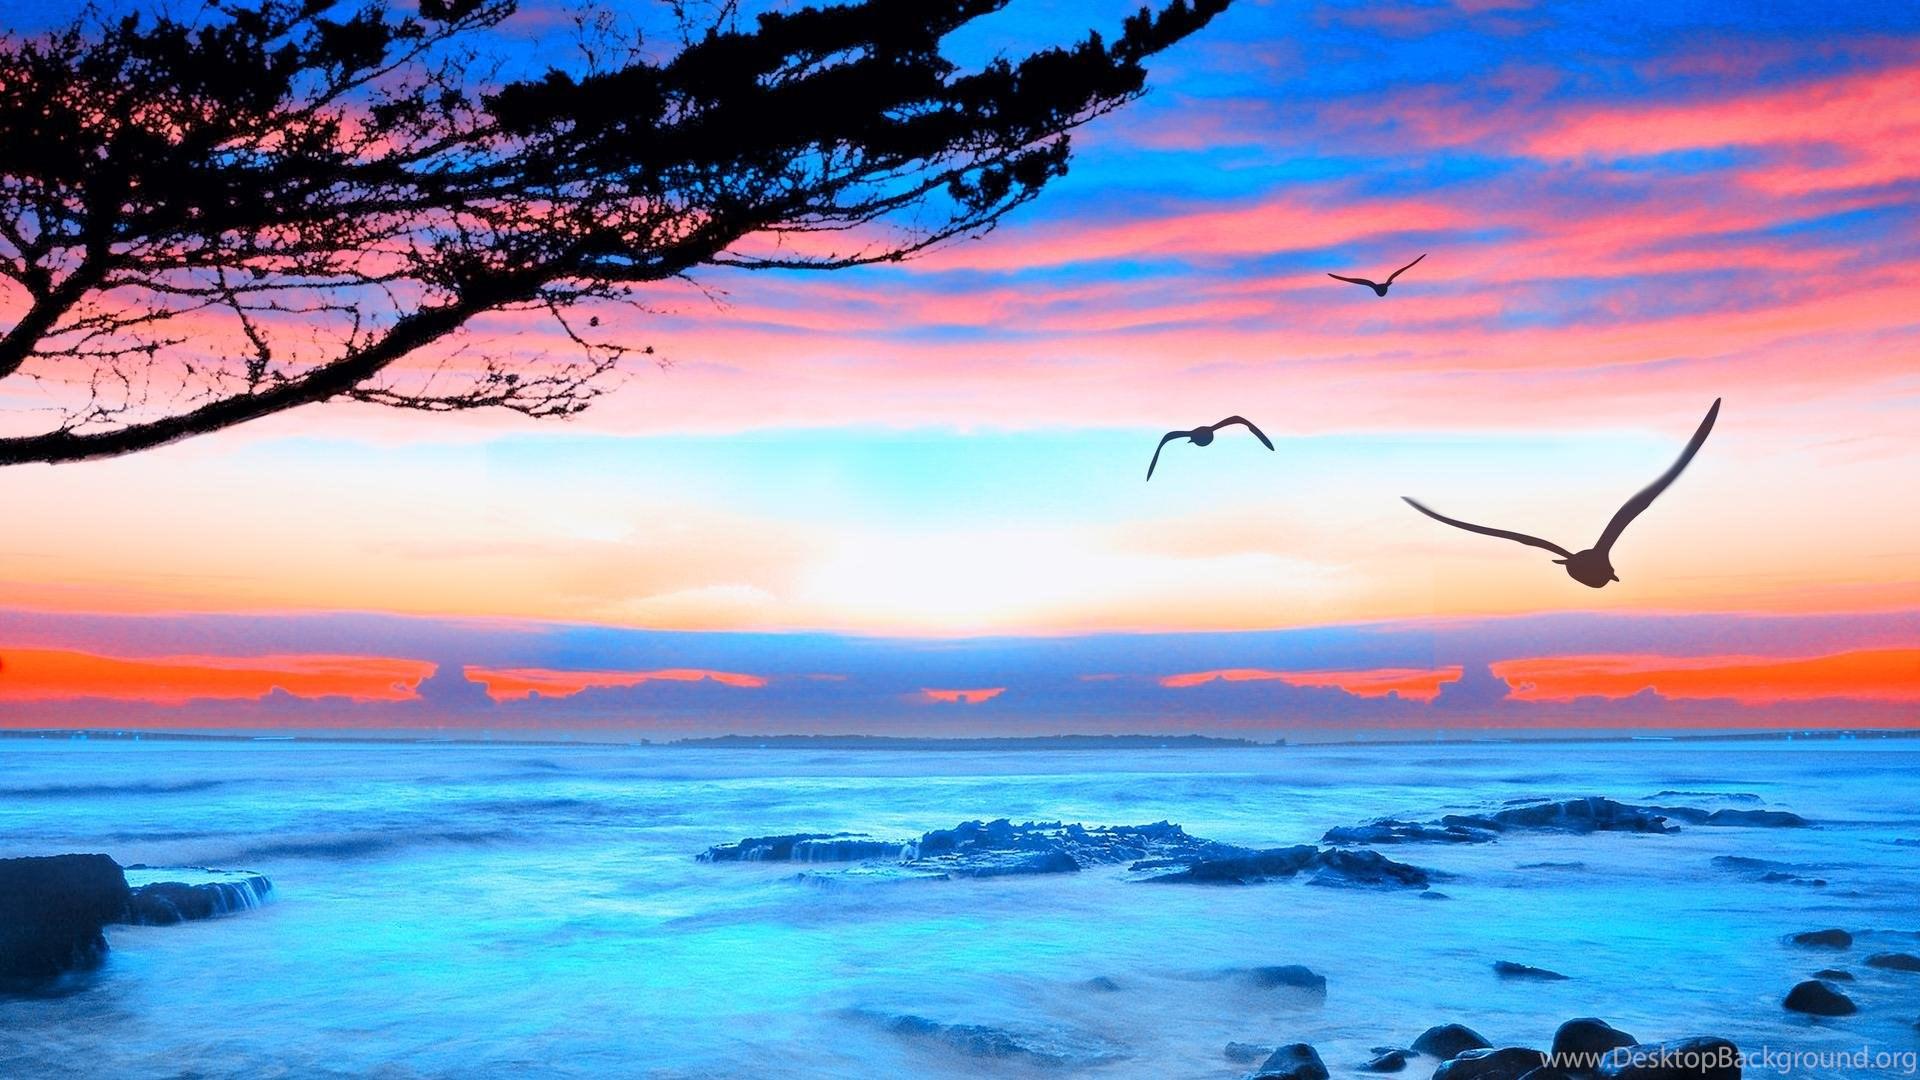 Hd Wallpapers 1080p Widescreen Ocean The Galleries Of Hd Wallpaper